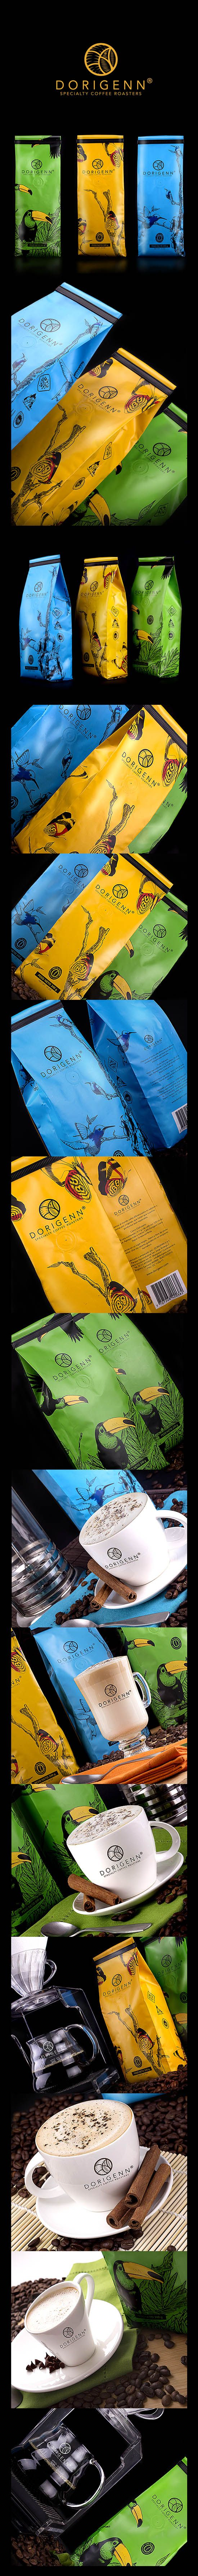 Packing Dorigenn Coffee Colombia